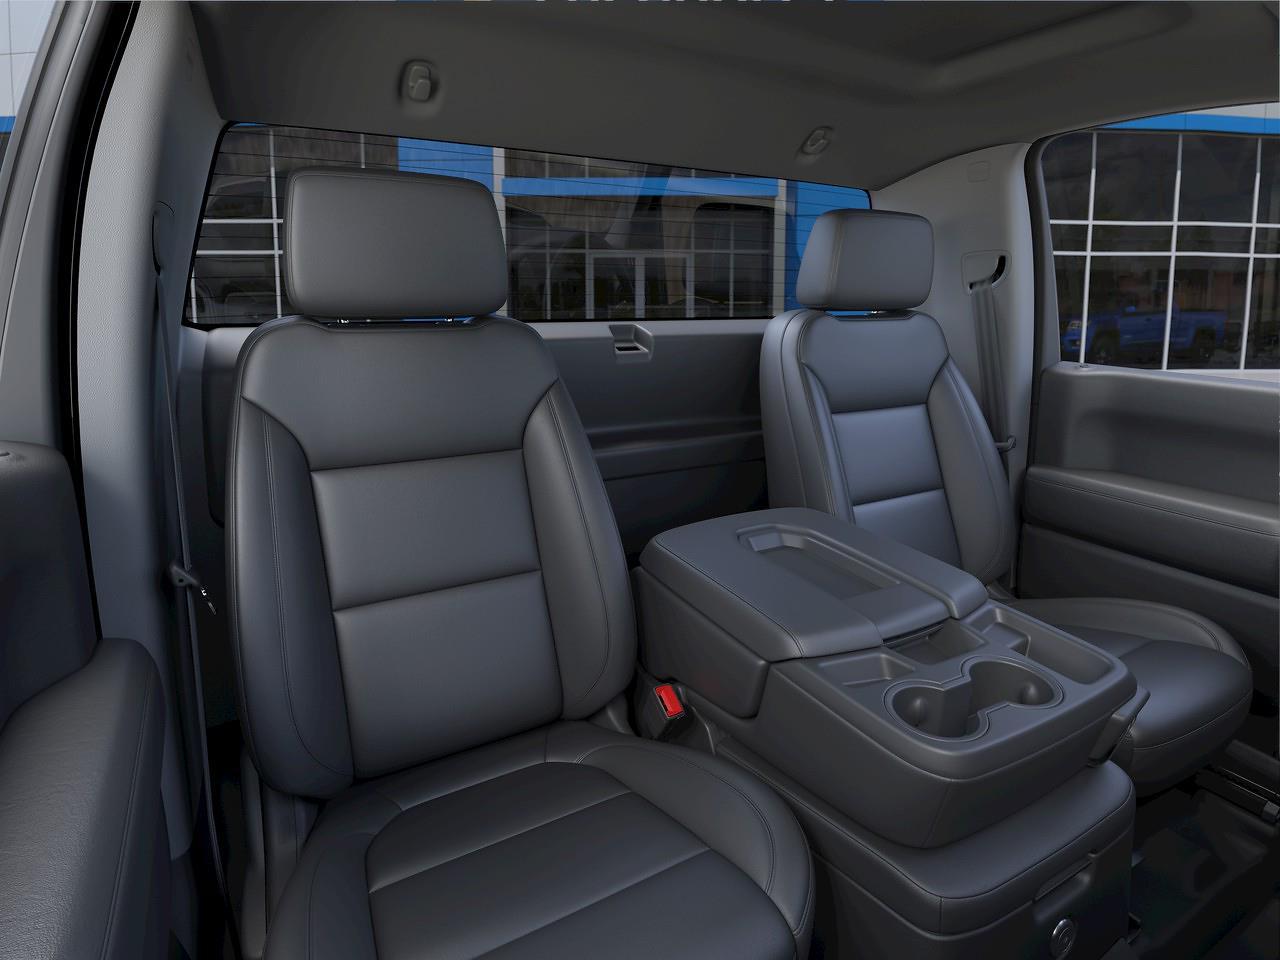 2021 Chevrolet Silverado 1500 Regular Cab 4x4, Pickup #Q210393 - photo 33